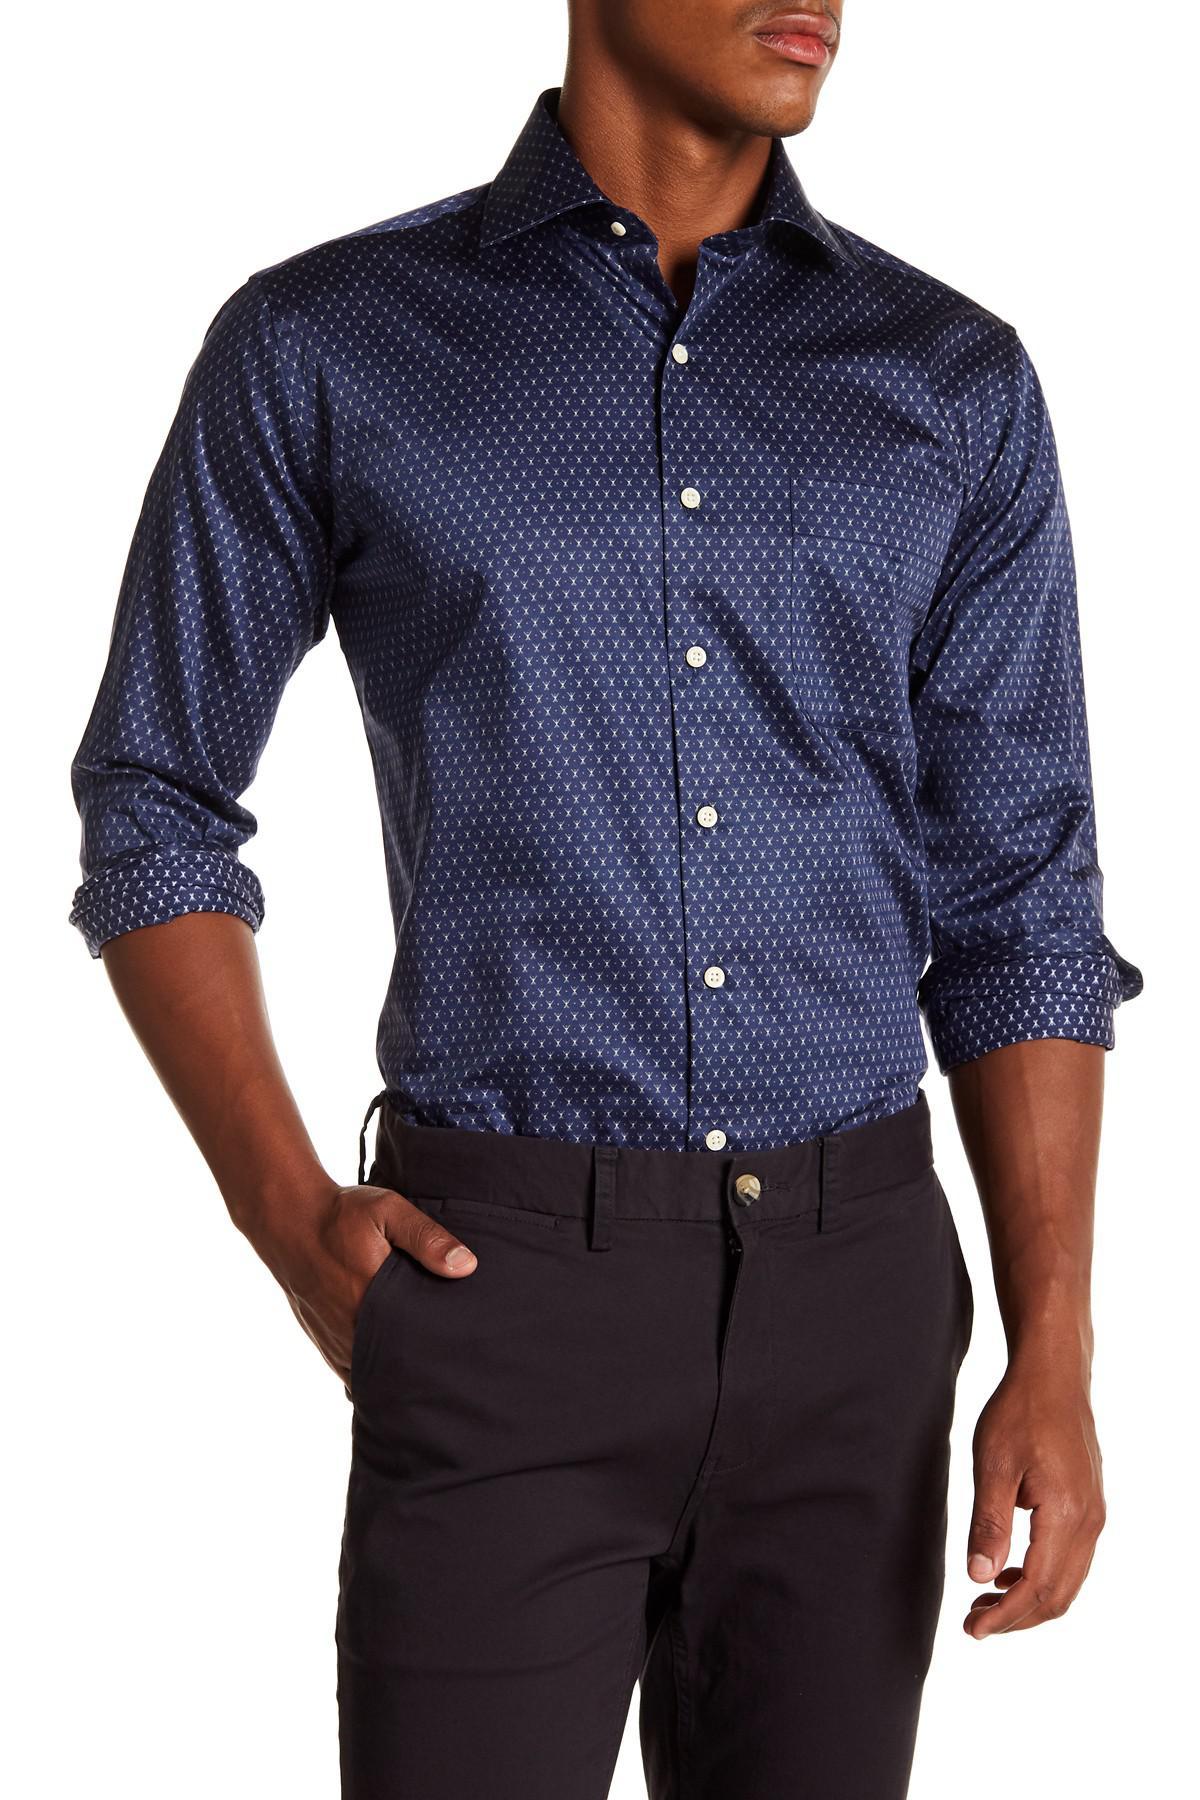 Mountainside Regular Fit Garment Dyed Long Sleeve Shirt Outlet Pick A Best lnBN0OYc